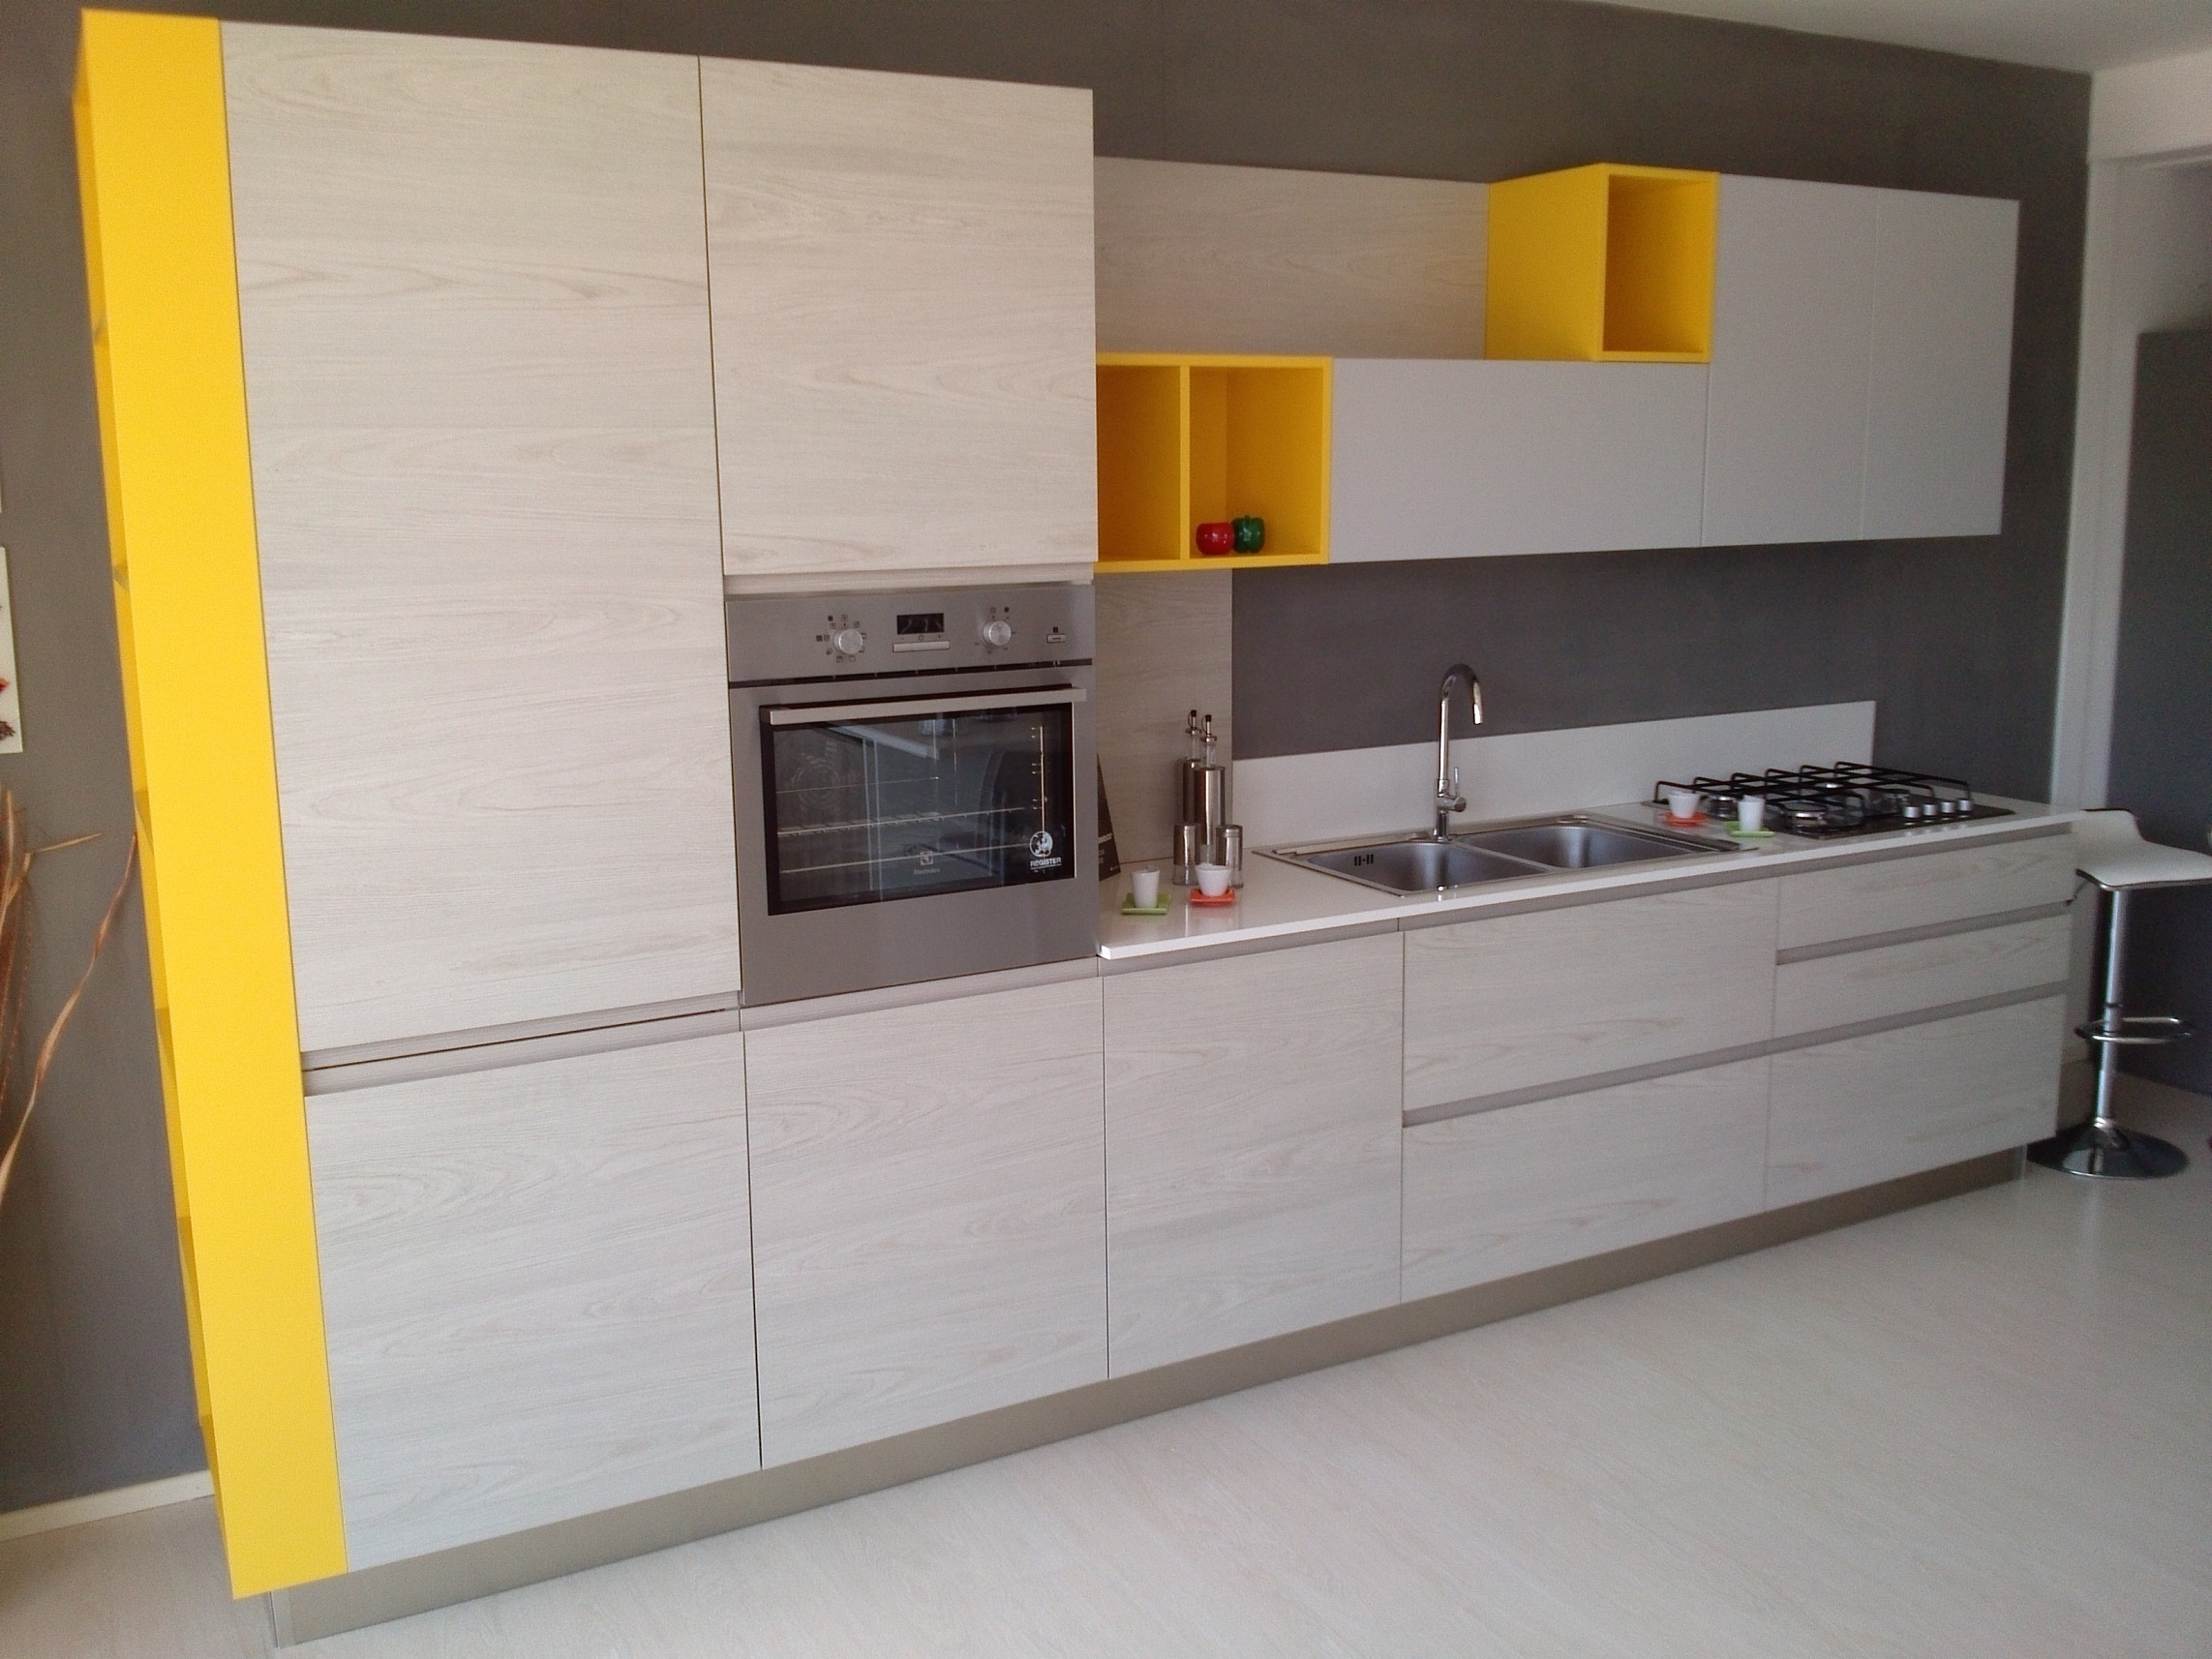 Best Cucina Wega Arredo 3 Gallery - Ideas & Design 2017 ...